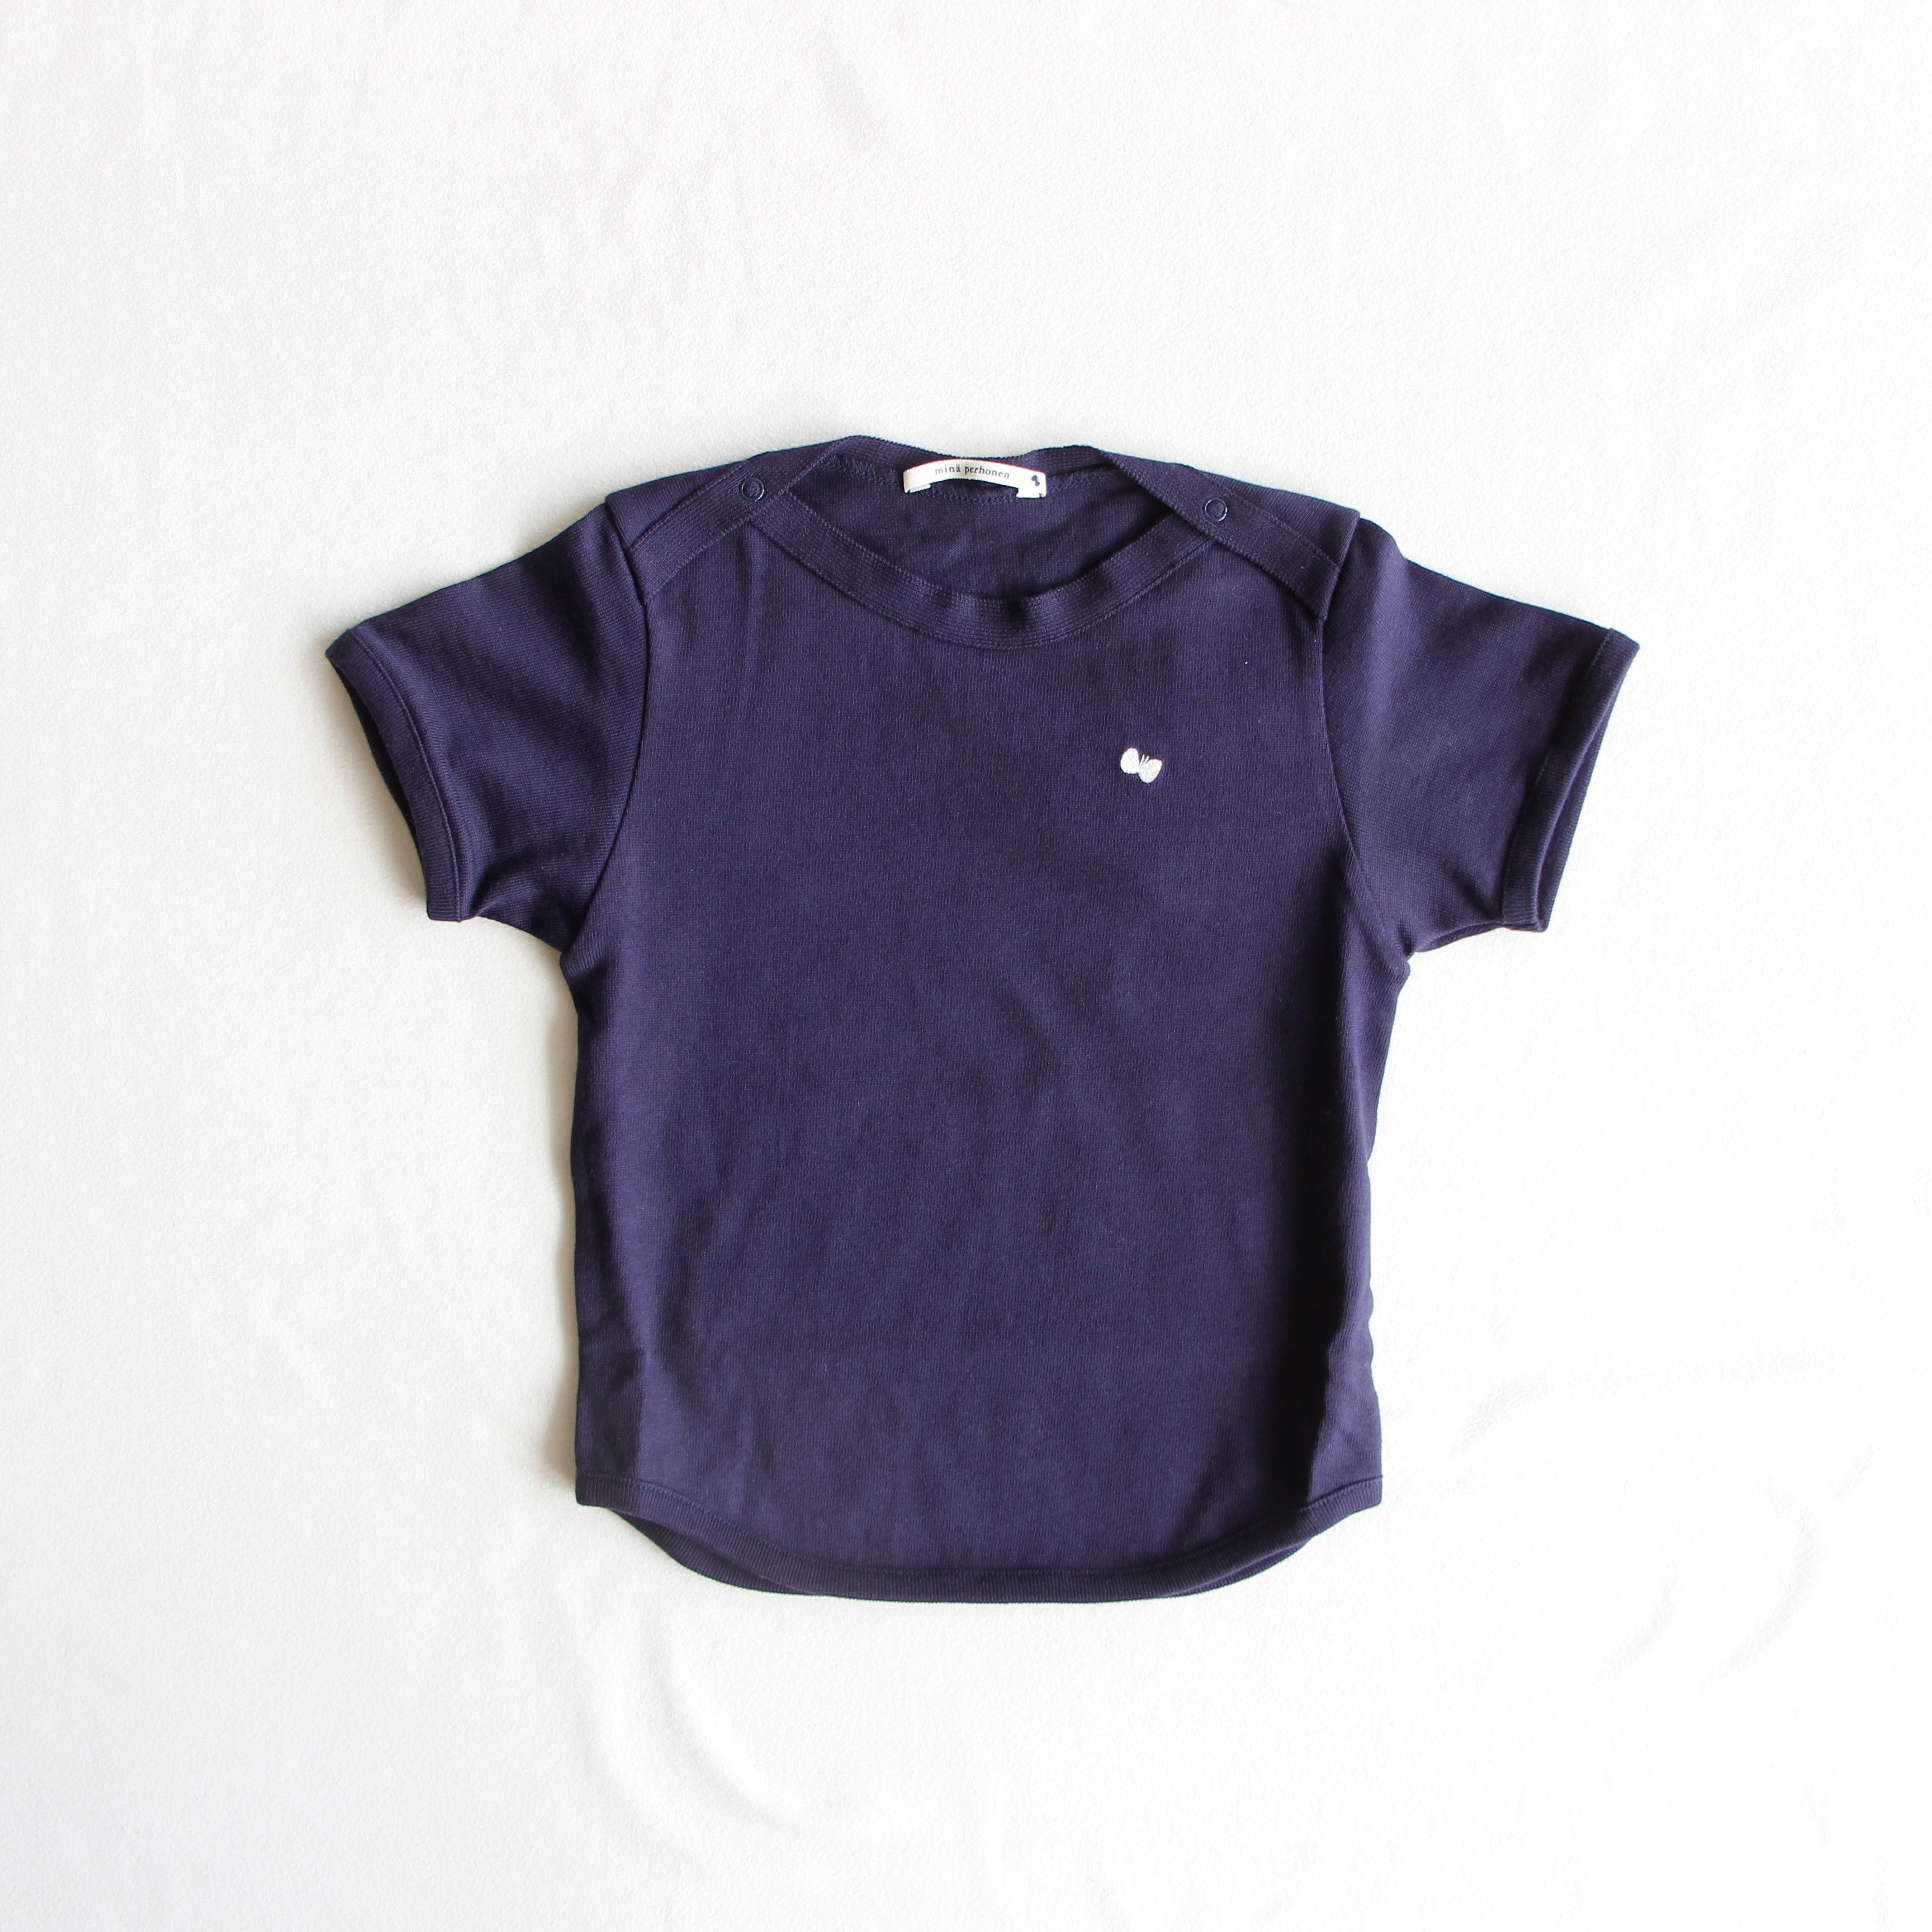 《mina perhonen 2018SS》zutto Tシャツ / navy / 80-100cm